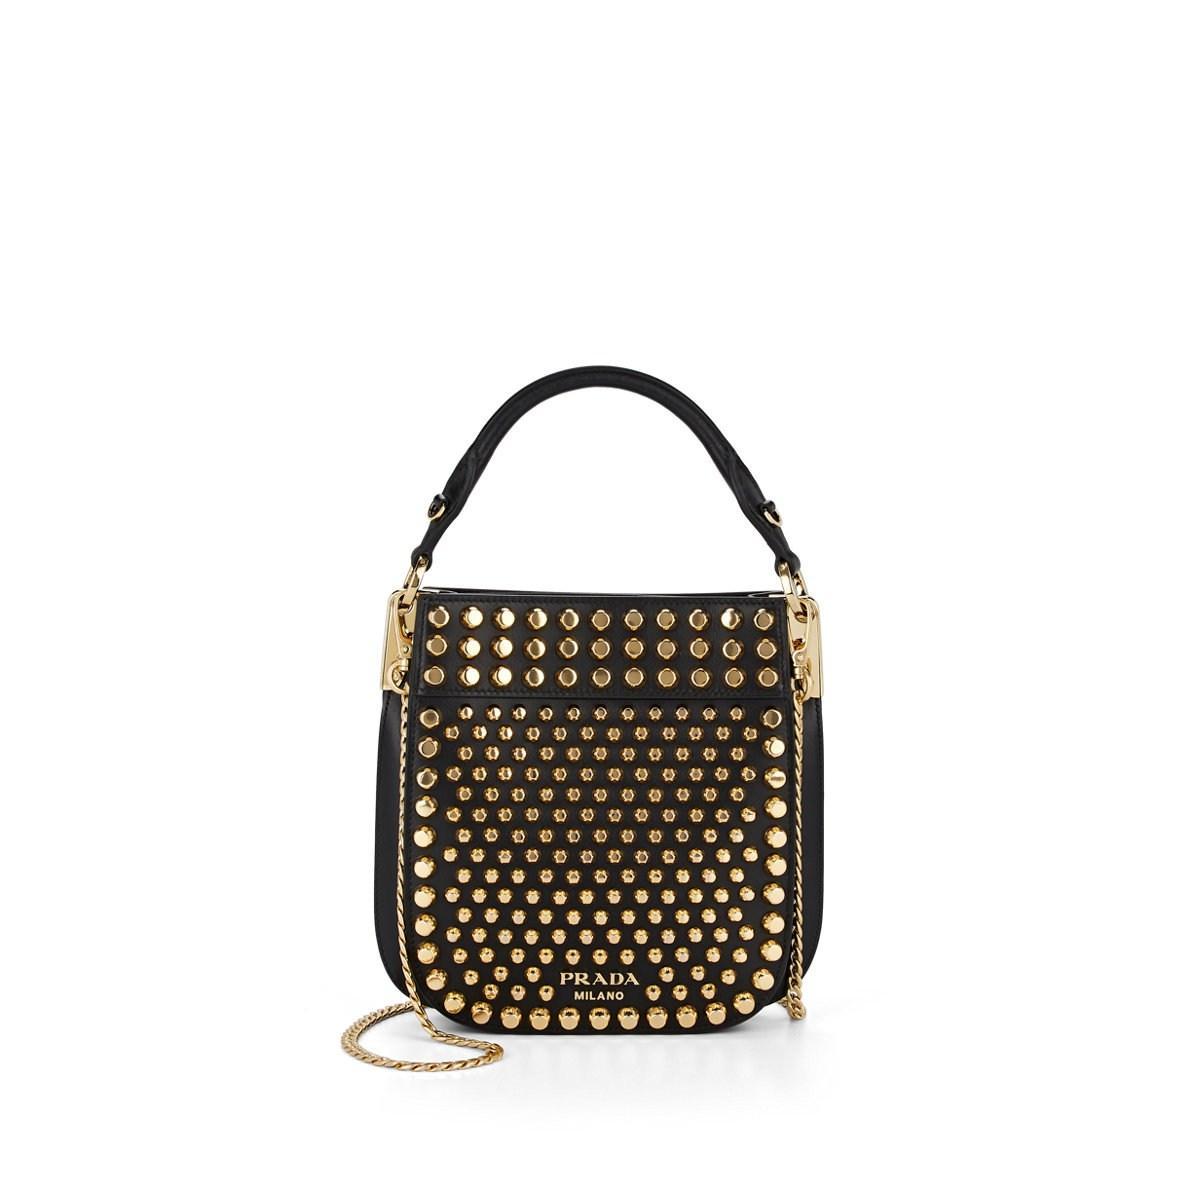 853c1c129193 Lyst - Prada Margit Small Studded Leather Shoulder Bag in Black